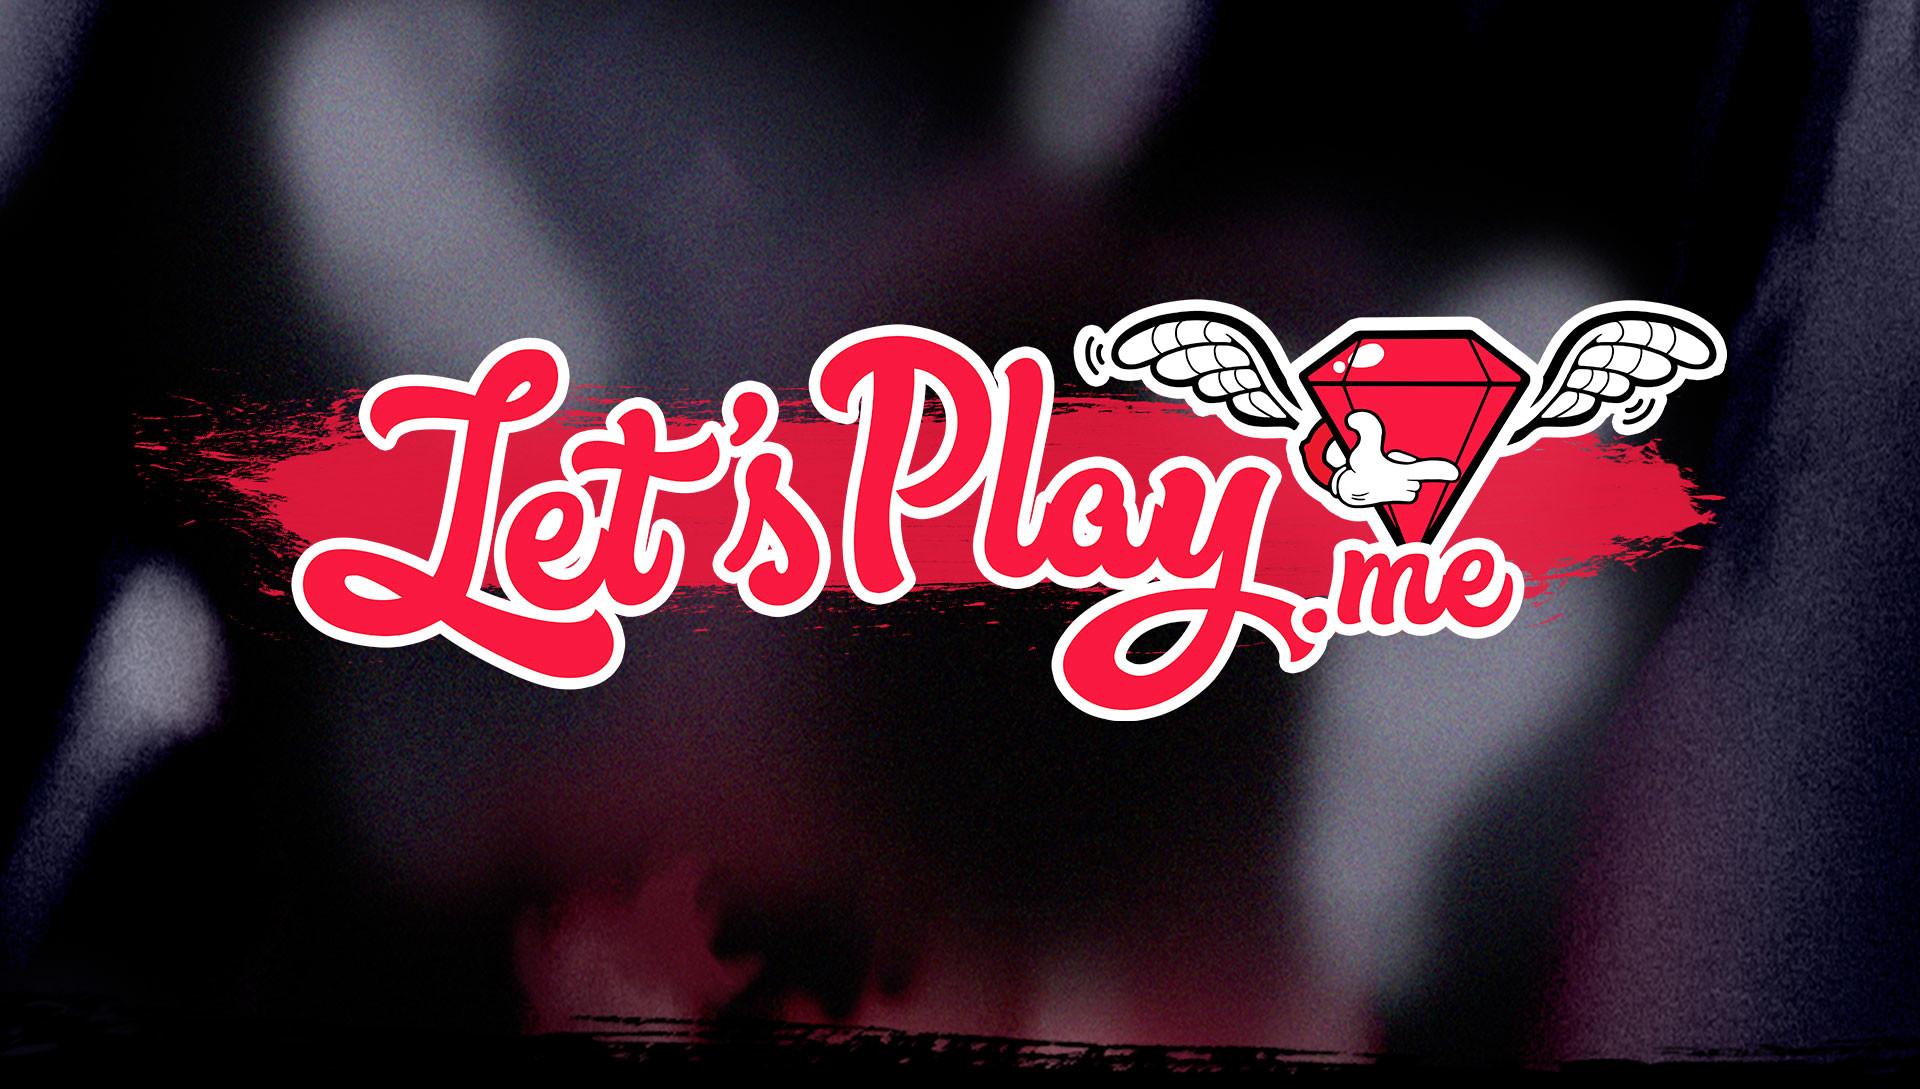 Combo 21 team letsplay logo 2